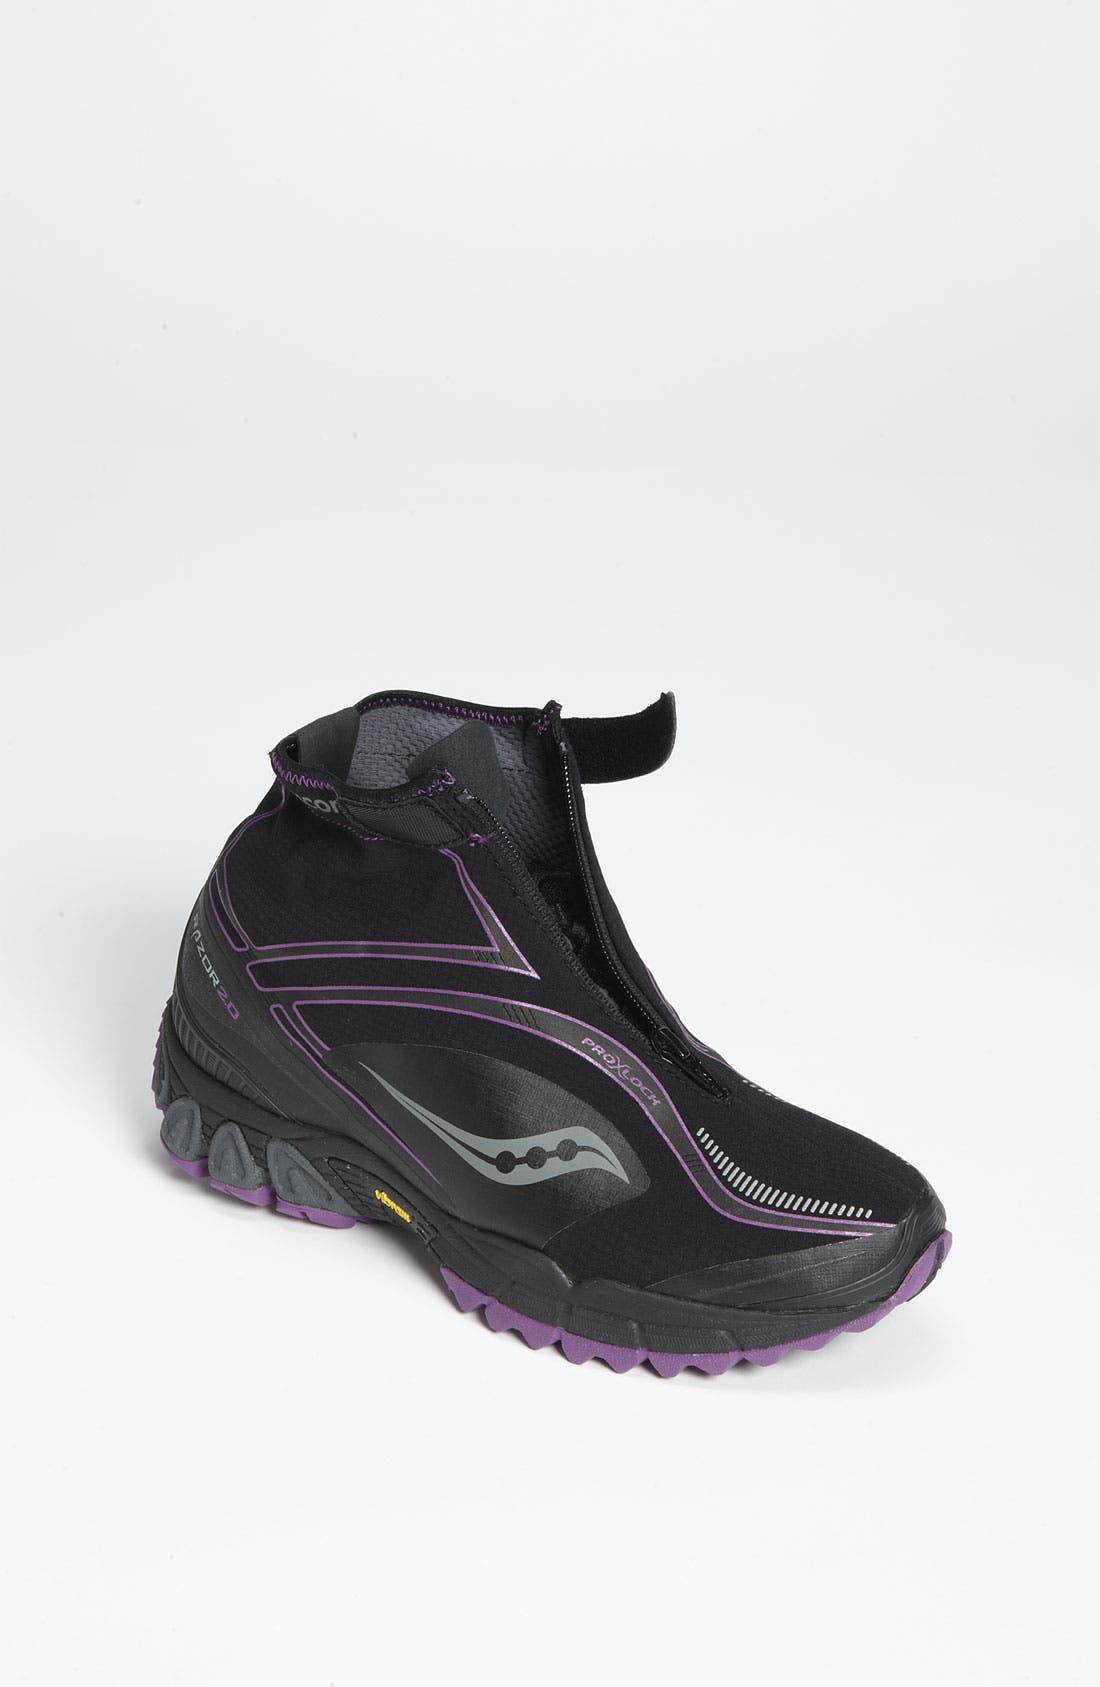 Alternate Image 1 Selected - Saucony 'ProGrid Razor 2.0' Running Shoe (Women)